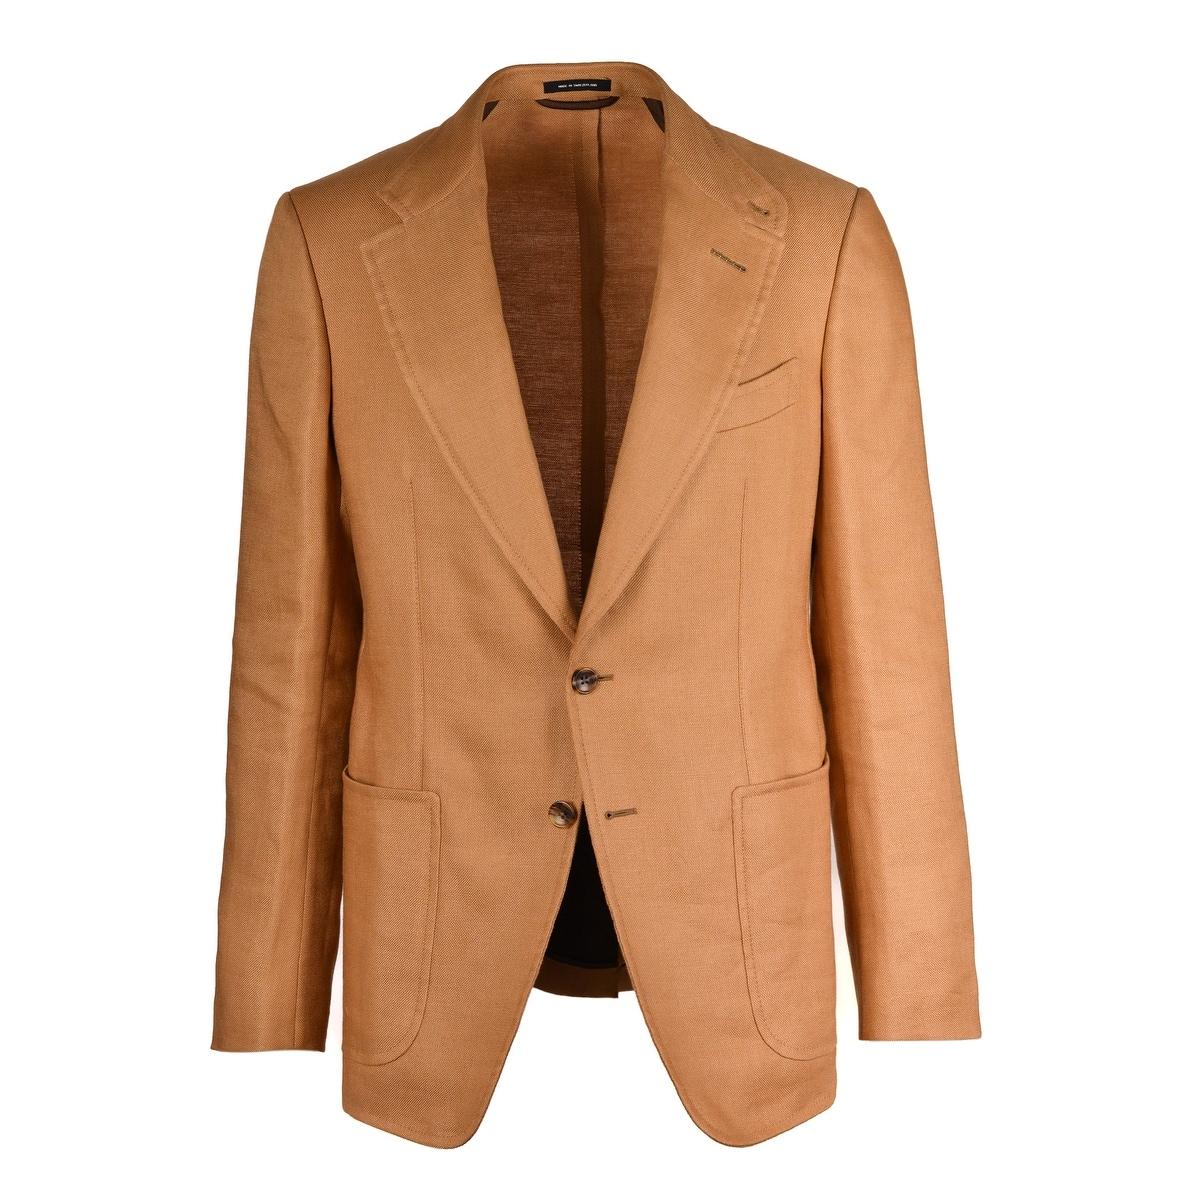 shop for original laest technology shop for authentic Tom Ford Mens Camel Brown Shelton Notch Lapel Jacket Blazer - 38